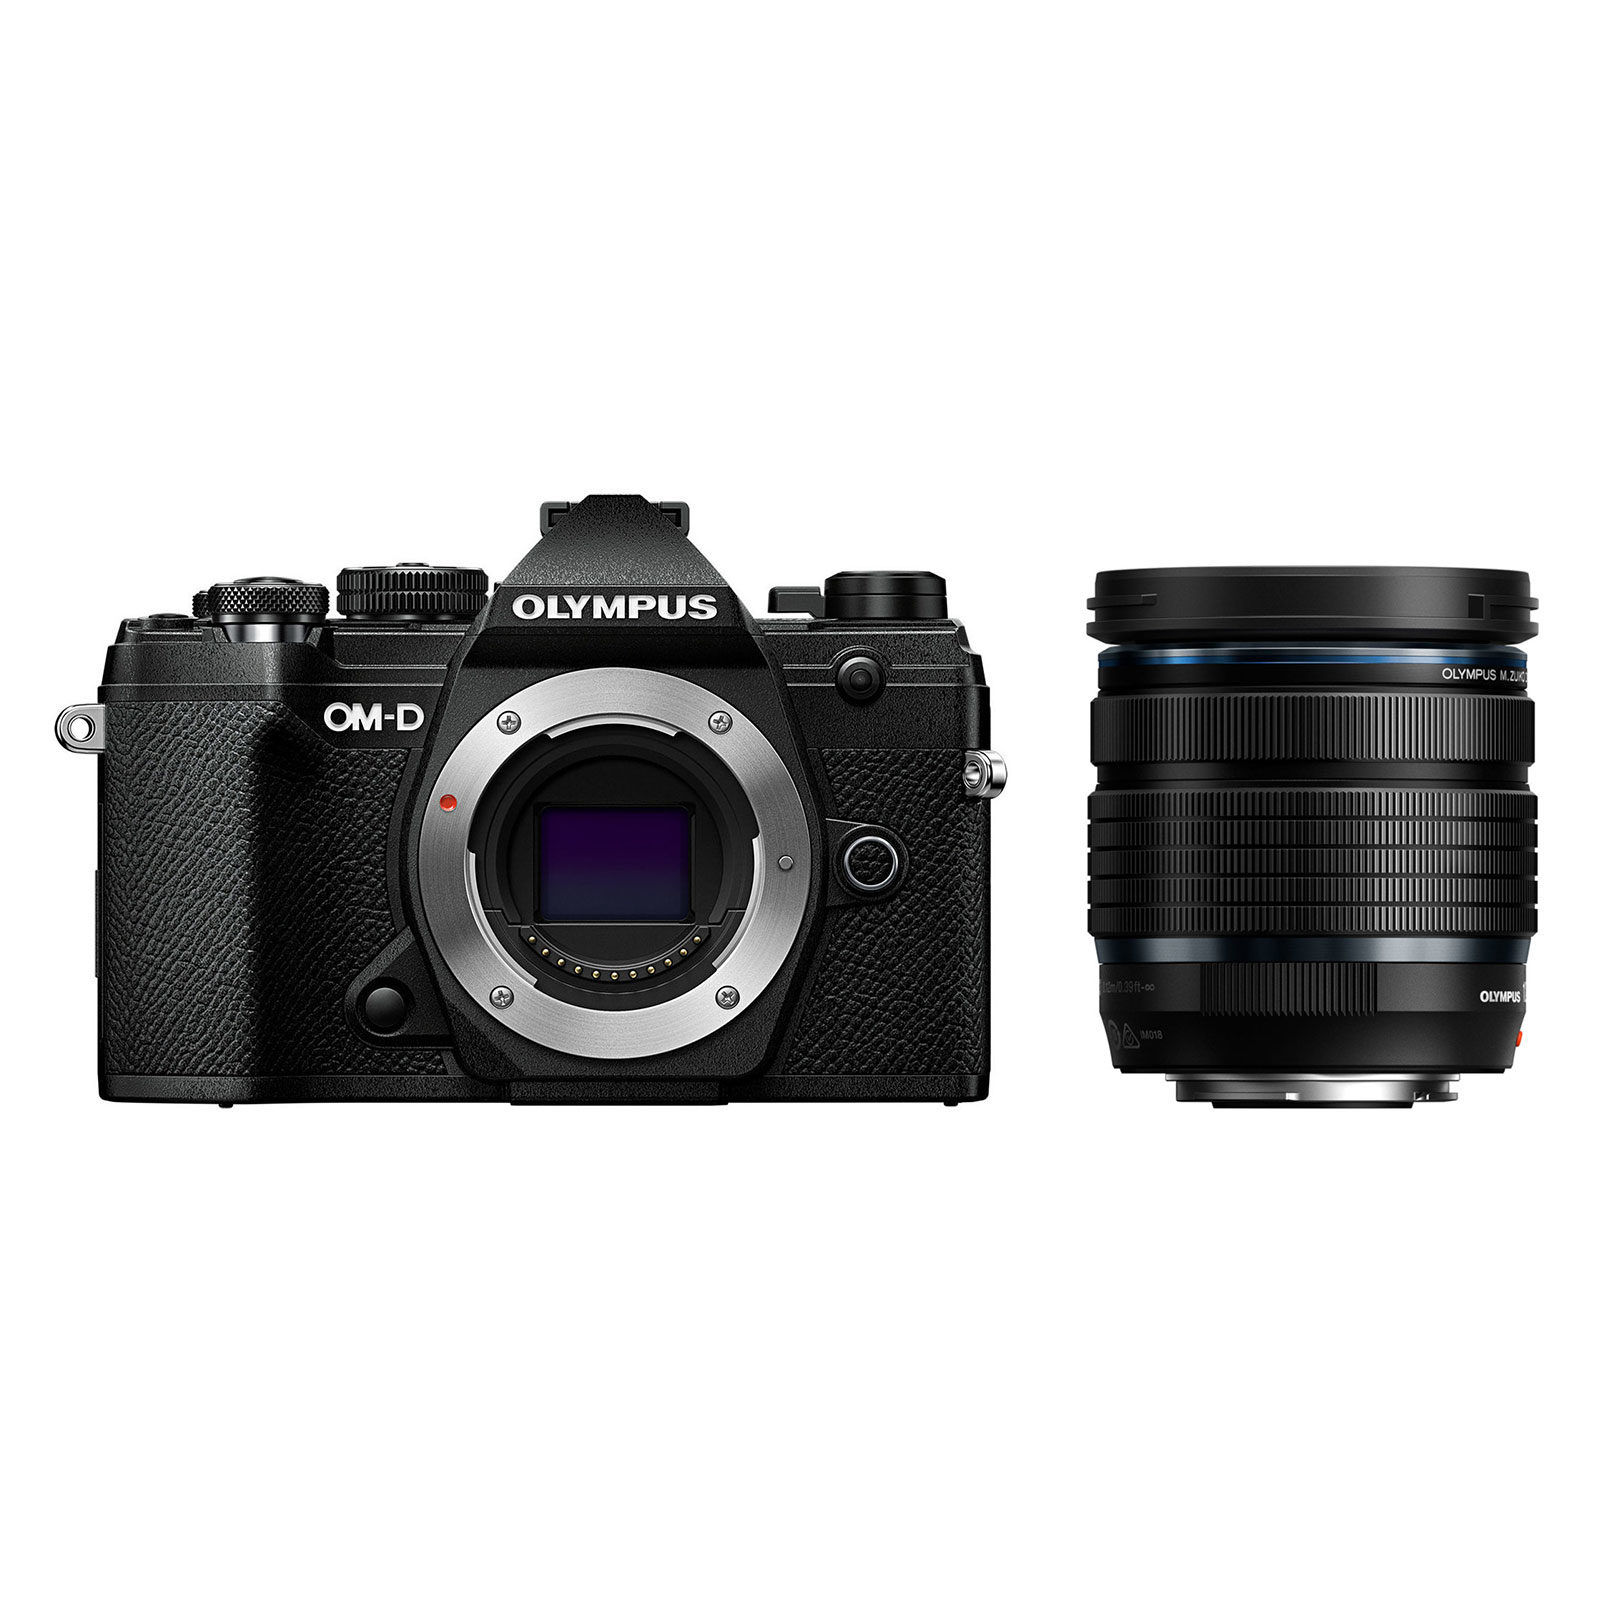 Olympus OM-D E-M5 Mark III systeemcamera Zwart + 12-45mm PRO <br/>€ 1599.00 <br/> <a href='https://www.cameranu.nl/fotografie/?tt=12190_474631_241358_&r=https%3A%2F%2Fwww.cameranu.nl%2Fnl%2Fp3186172%2Folympus-om-d-e-m5-mark-iii-systeemcamera-zwart-12-45mm-pro%3Fchannable%3De10841.MzE4NjE3Mg%26utm_campaign%3D%26utm_content%3DOM-D%2Bserie%26utm_source%3DTradetracker%26utm_medium%3Dcpc%26utm_term%3DDigitale%2Bcamera%26apos%3Bs' target='_blank'>naar de winkel</a>